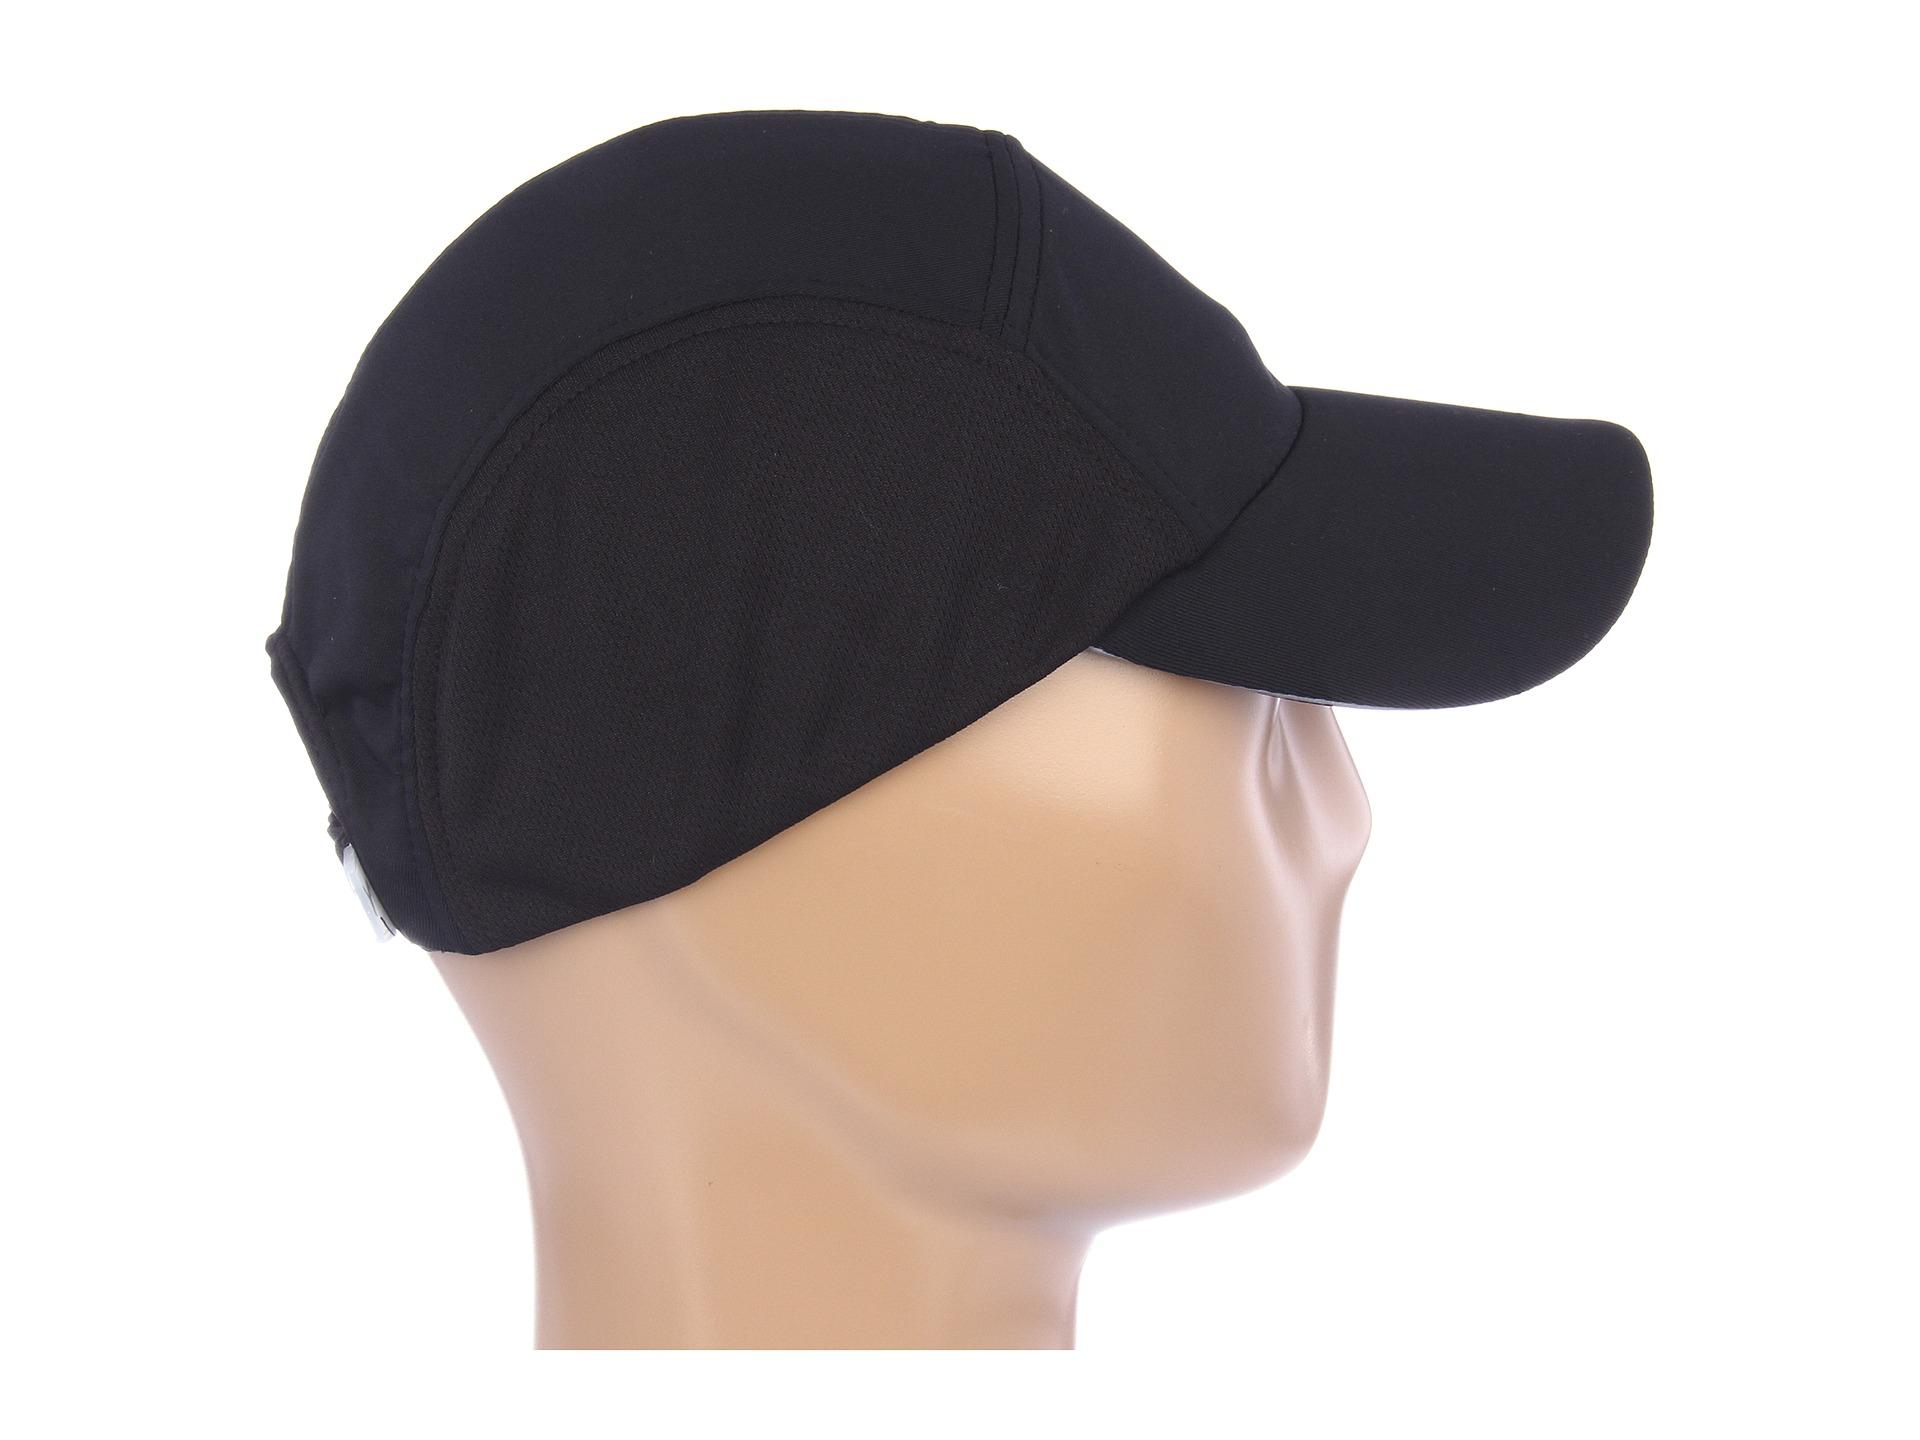 094f596d2fec4 PUMA Lightweight Performance Apex Running Cap in Black for Men - Lyst